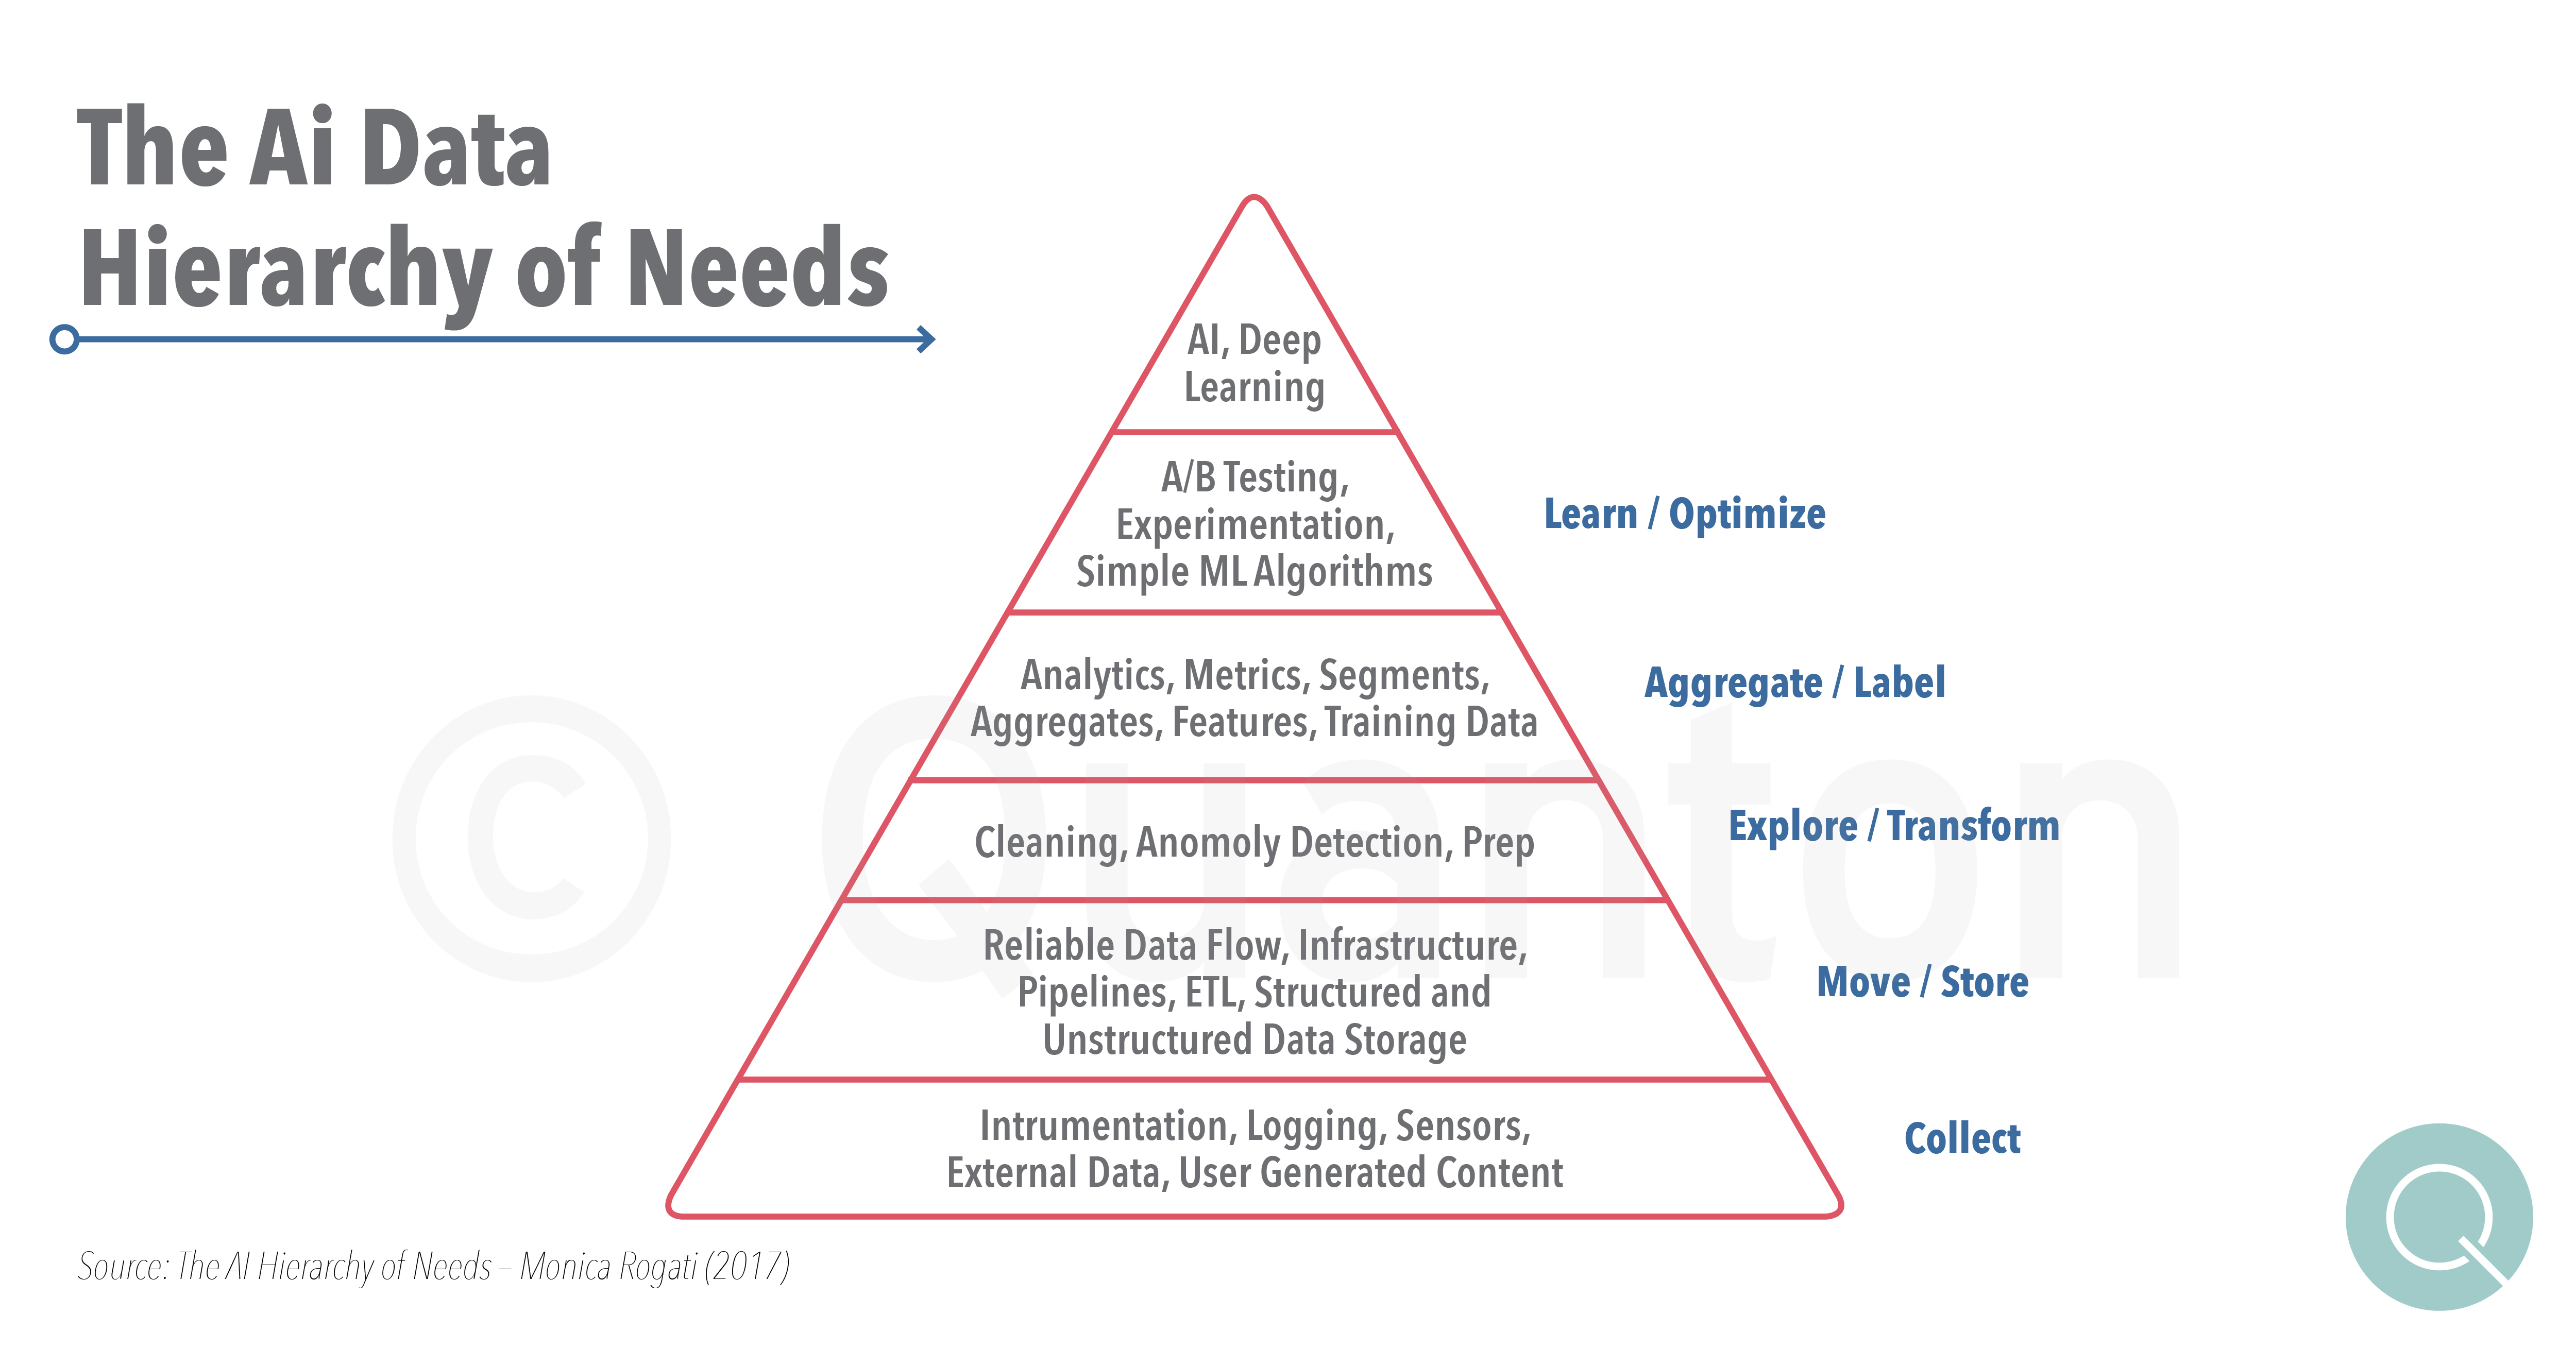 San Francisco Summit Key Learing Data Hierarchy